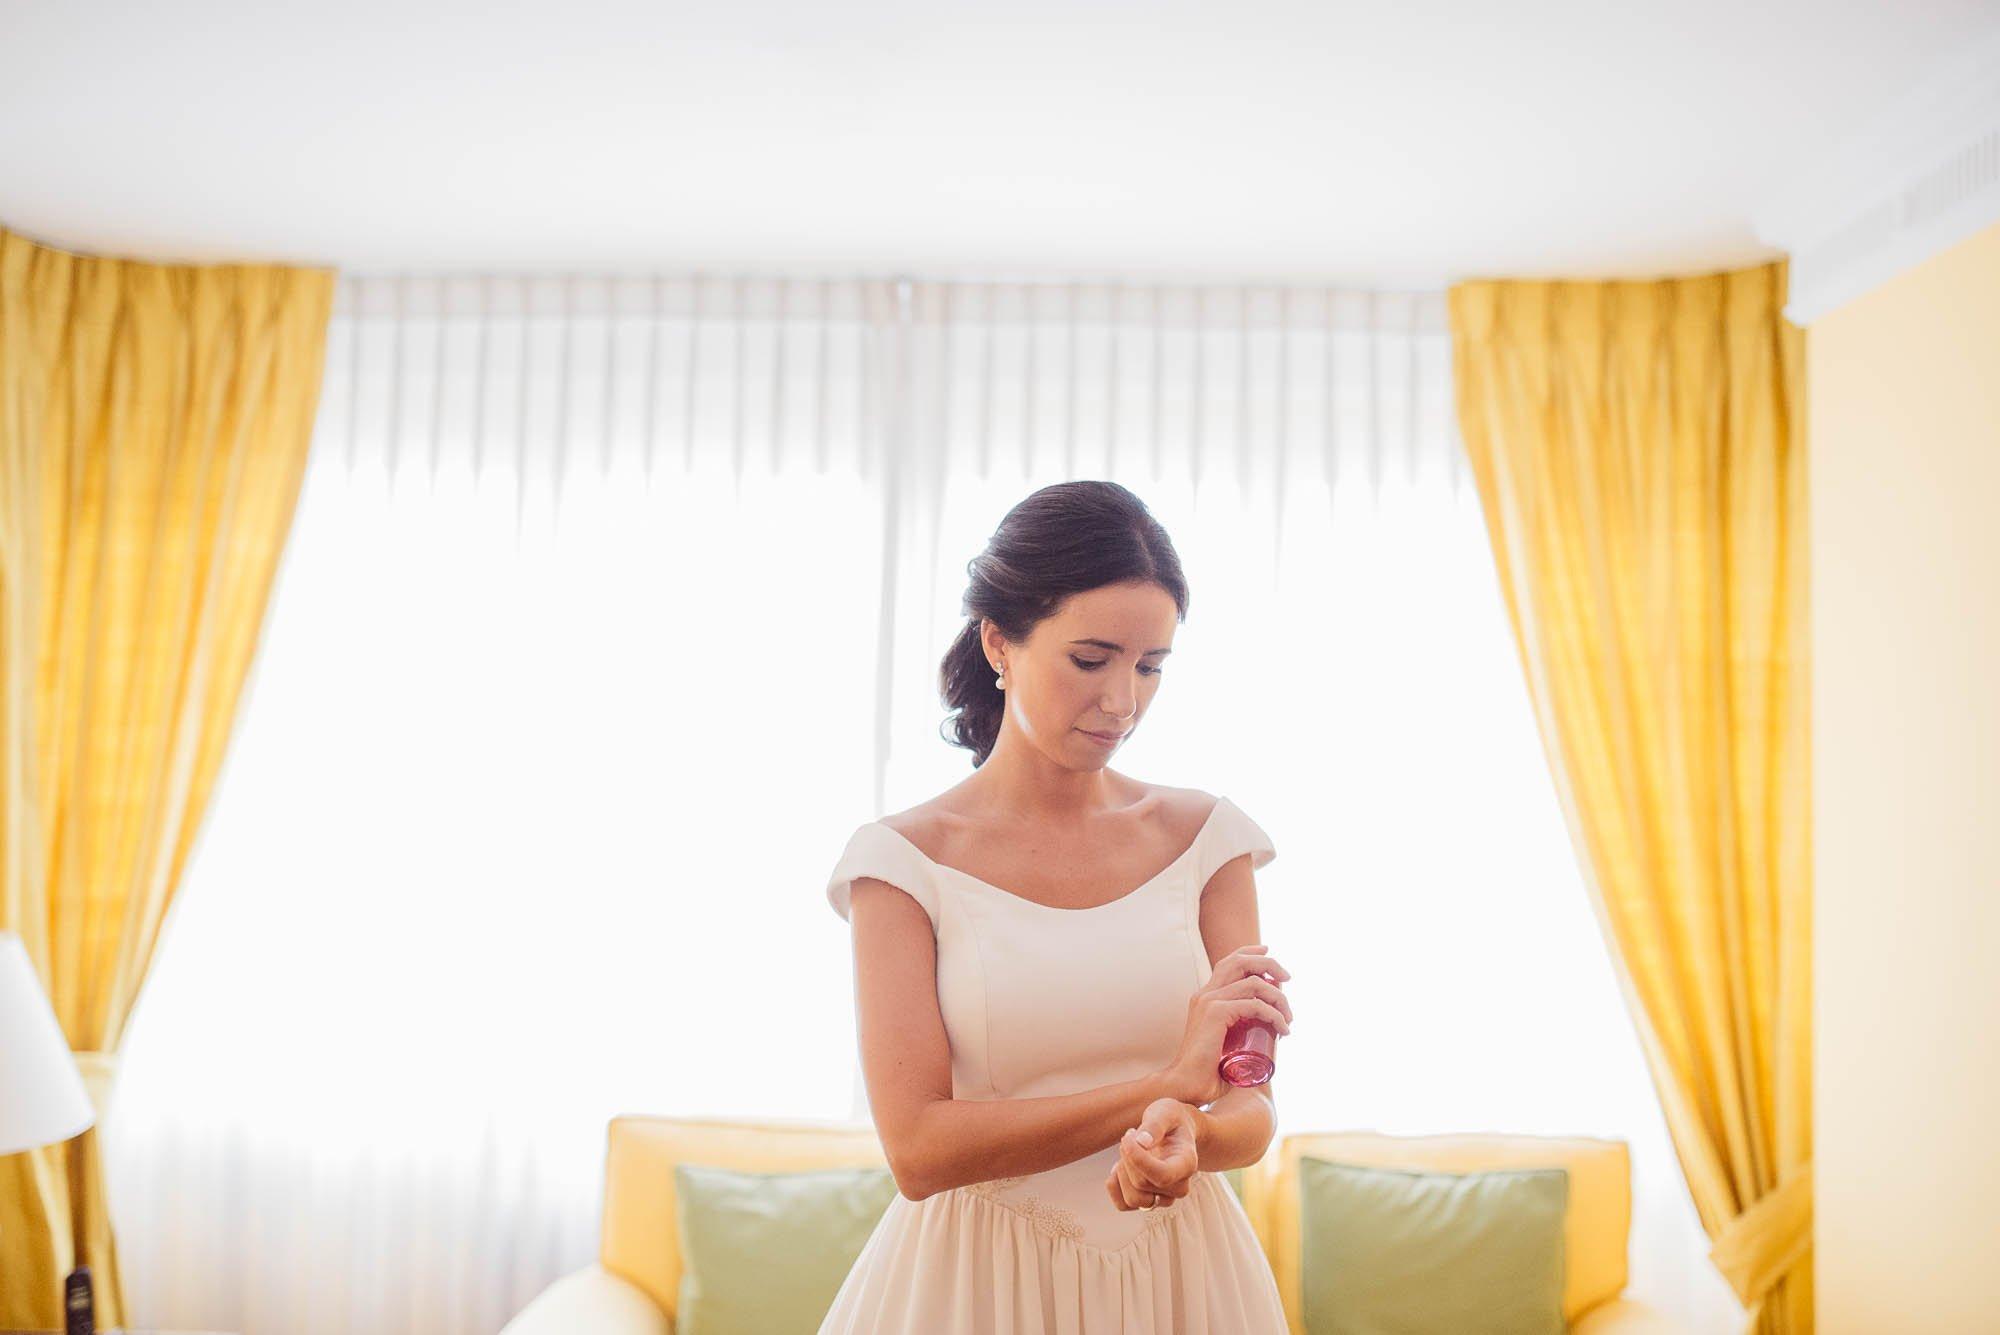 La novia se pone perfume delante del ventanal